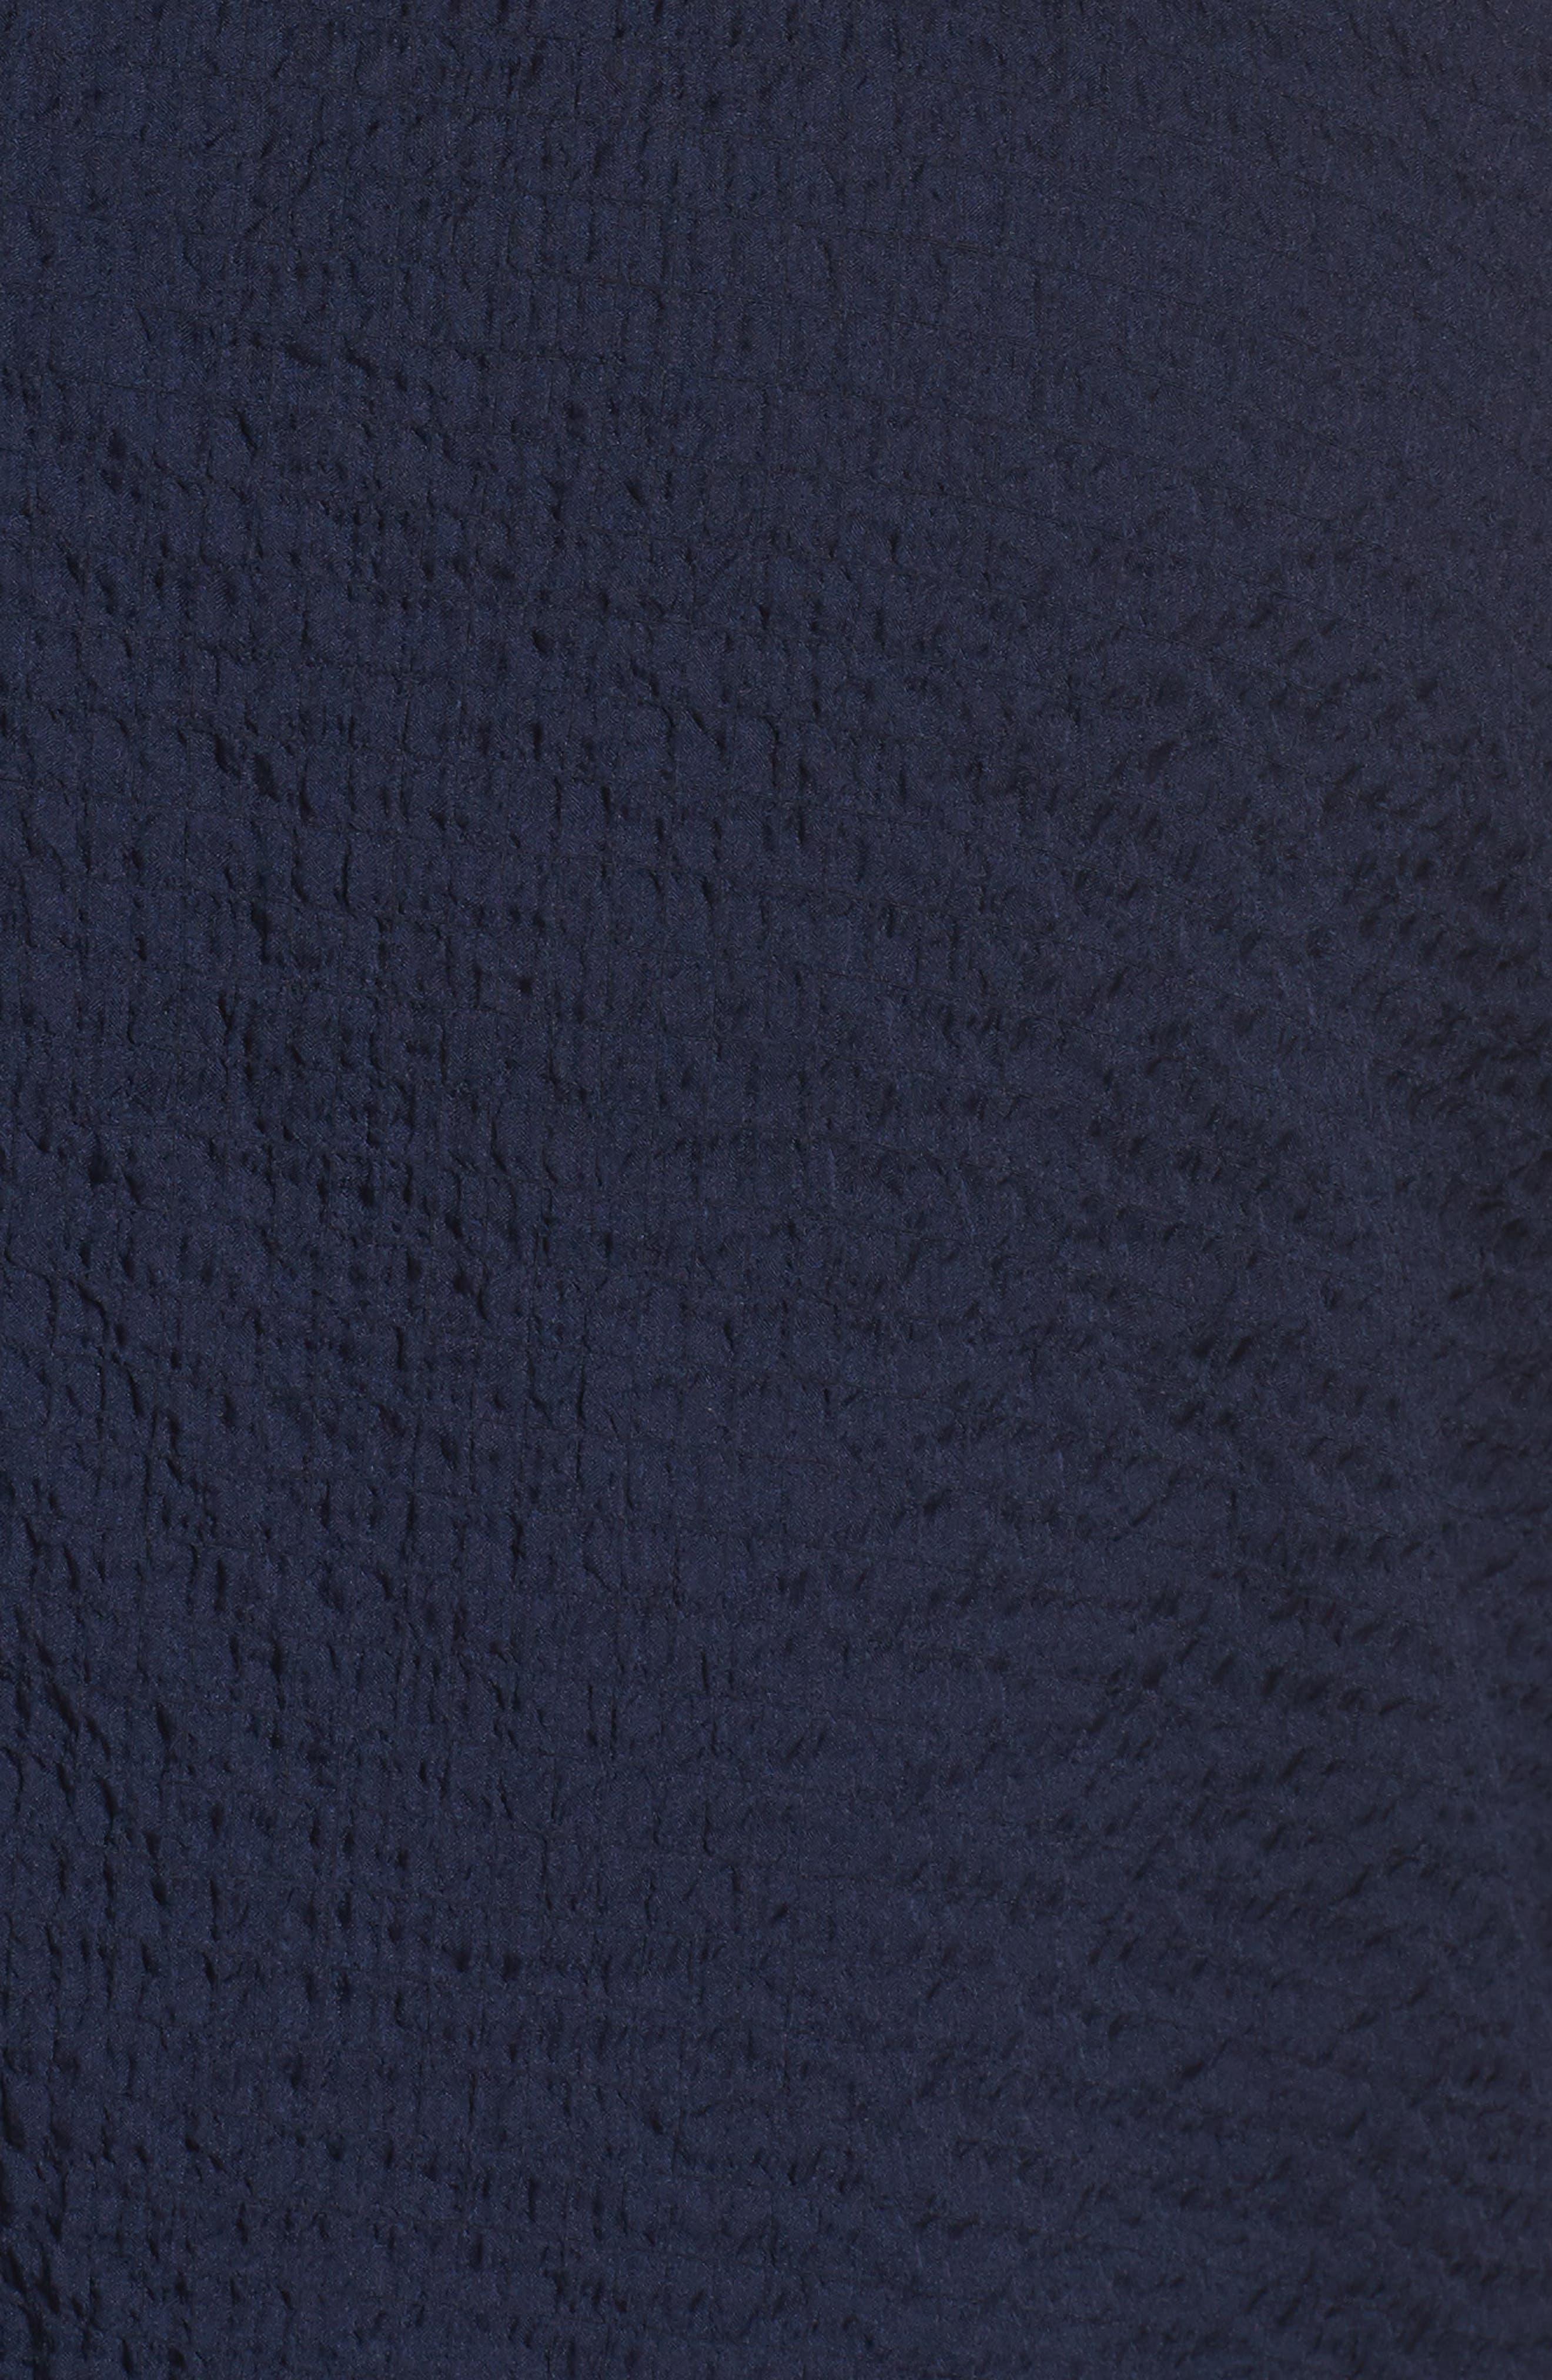 Sheer Batwing Blouse,                             Alternate thumbnail 5, color,                             410